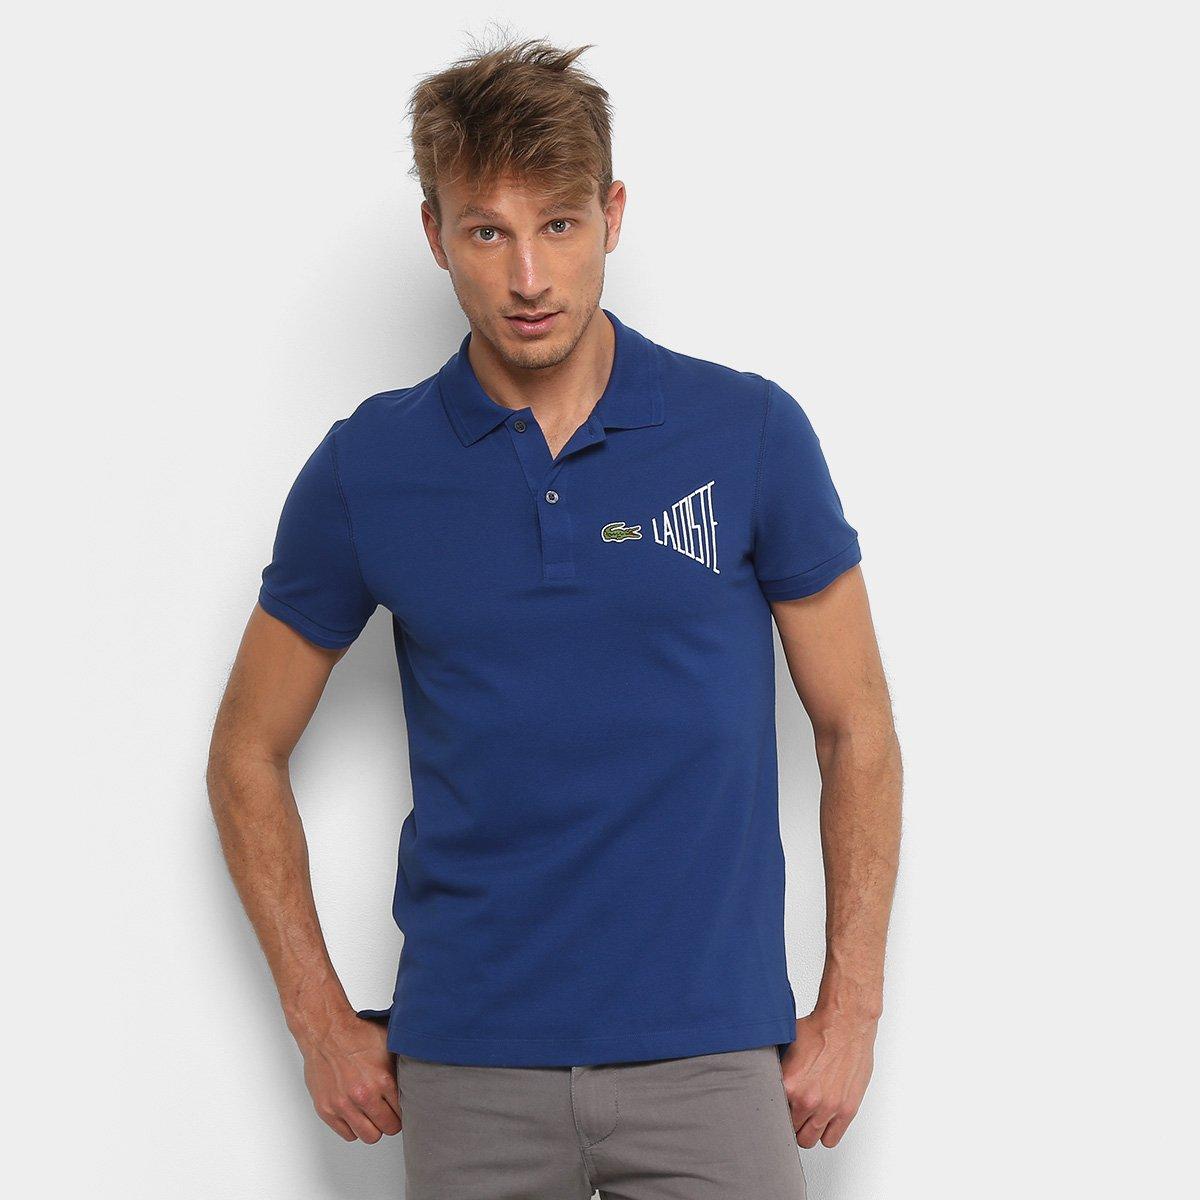 ee84320676 Camisa Polo Lacoste Clássica Masculina - Marinho e Branco - Compre Agora